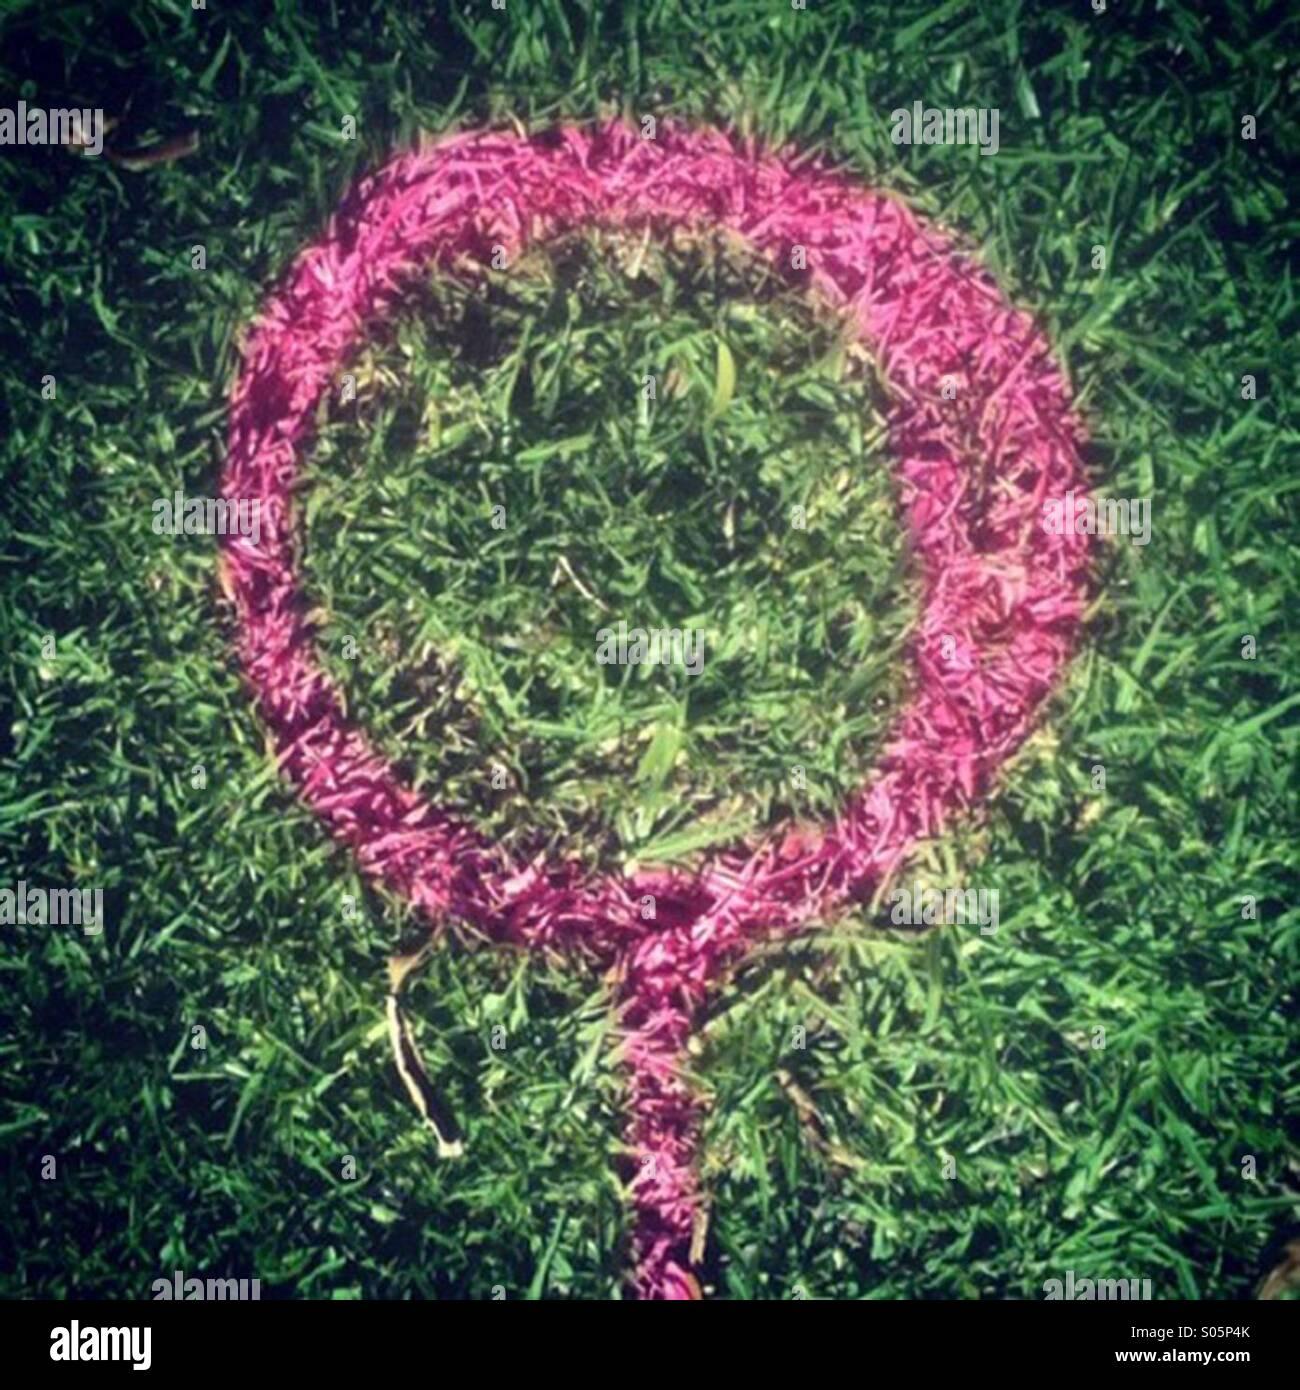 Purple marking on grass - Stock Image